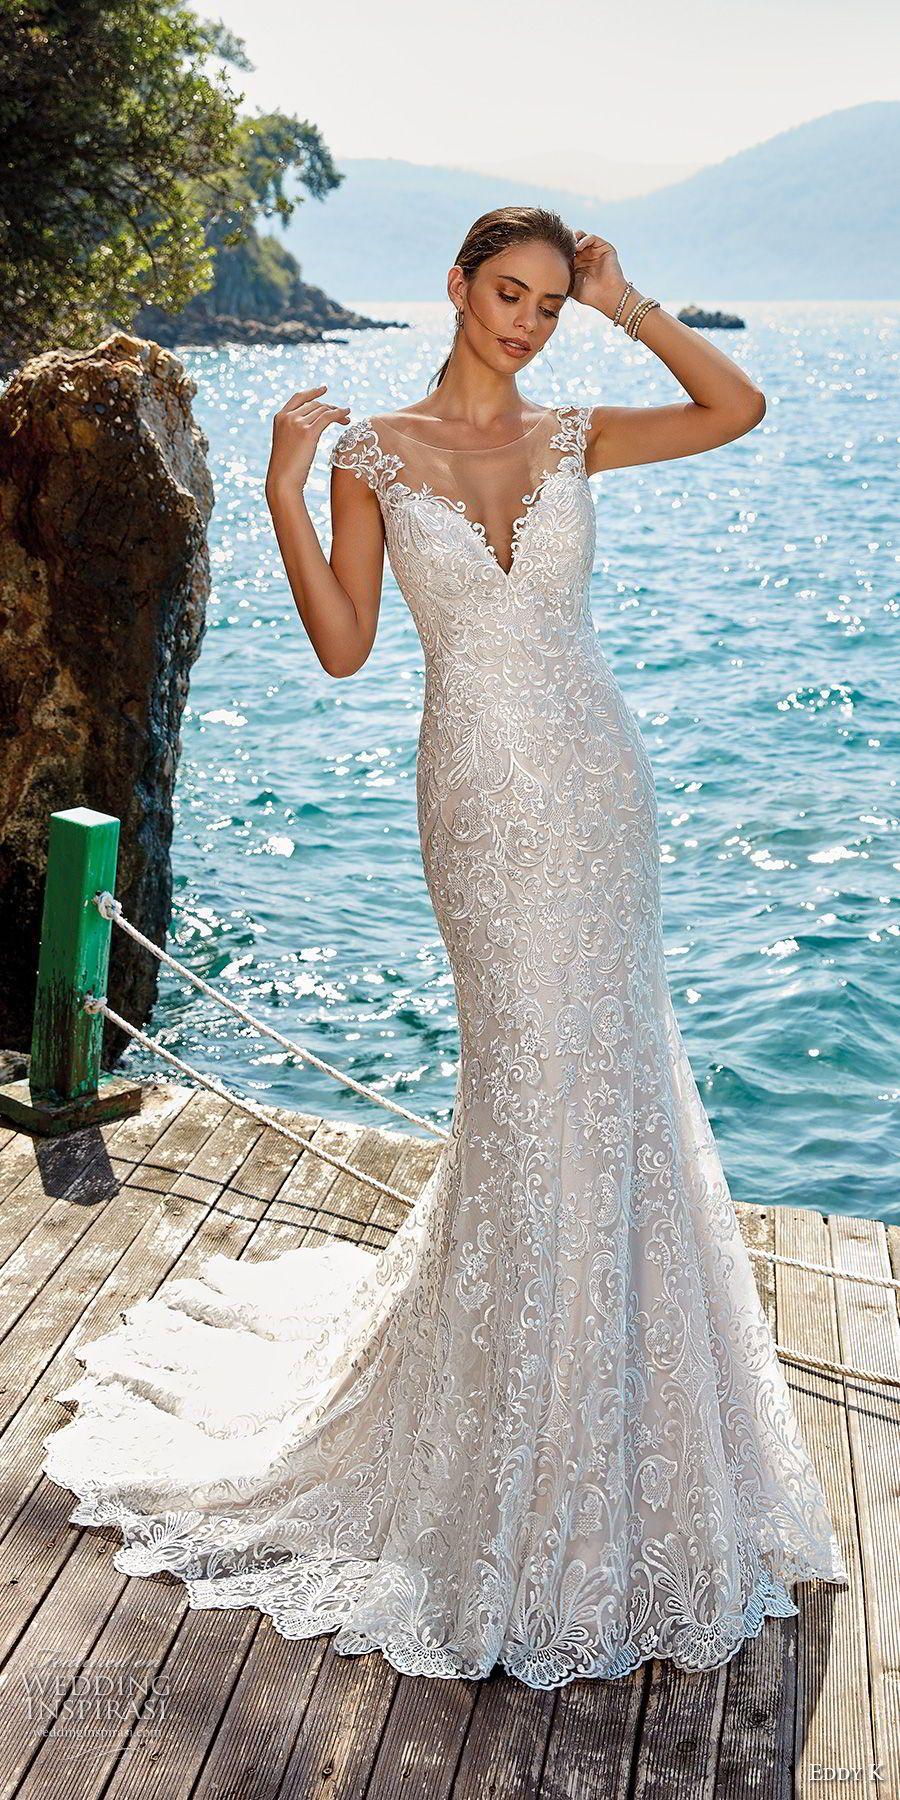 Teal and white wedding dresses  Eddy K Dreams  Wedding Dresses  Wedding Dresses  Pinterest